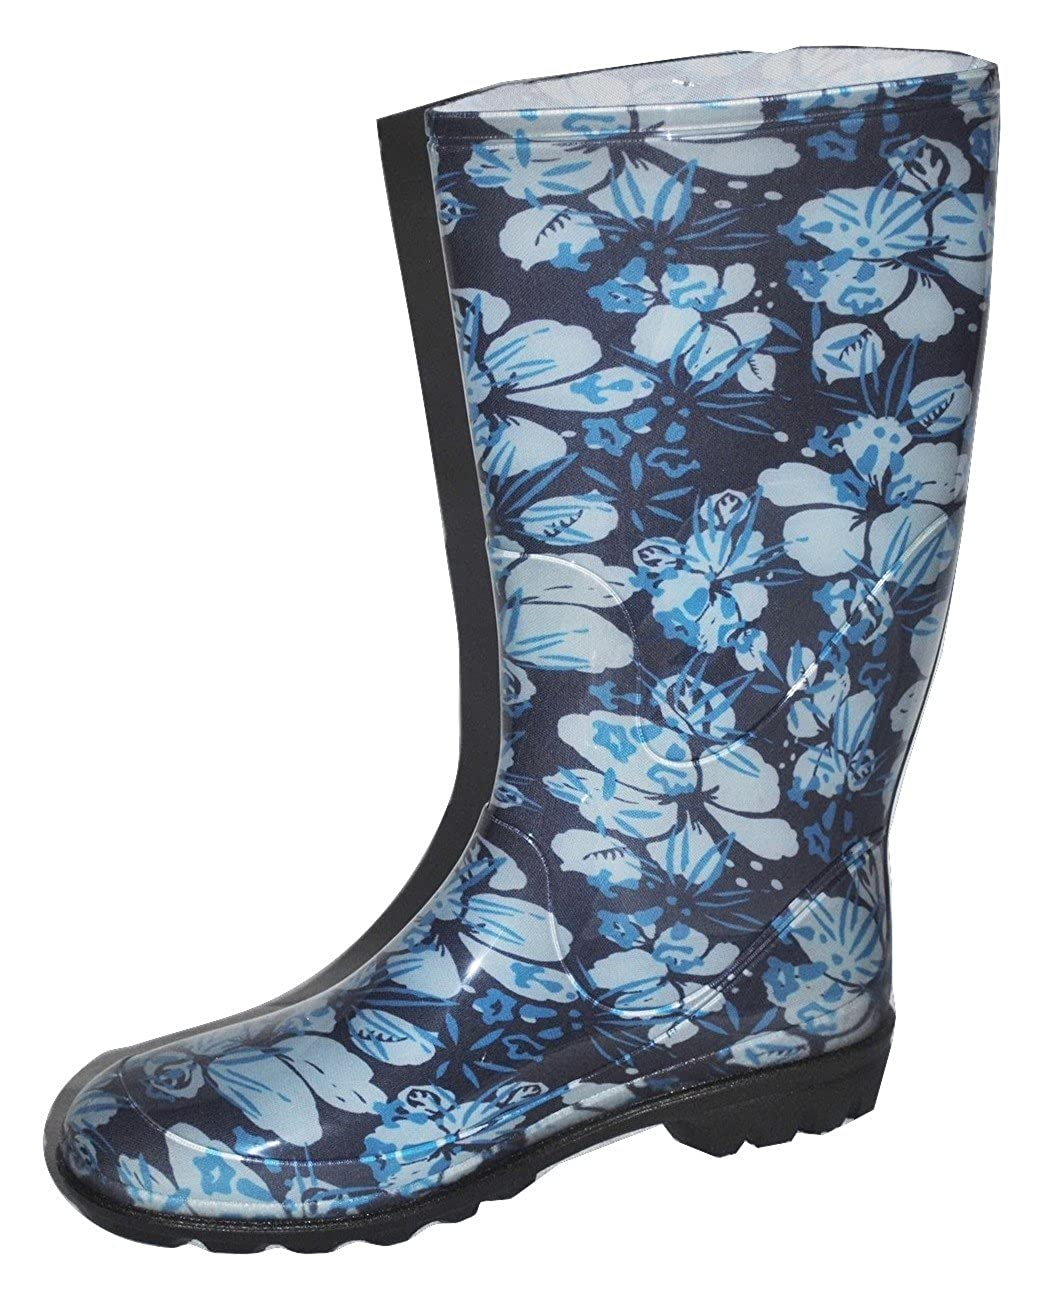 Kamik Womens Rain Boots Size 9 US 39 EUR